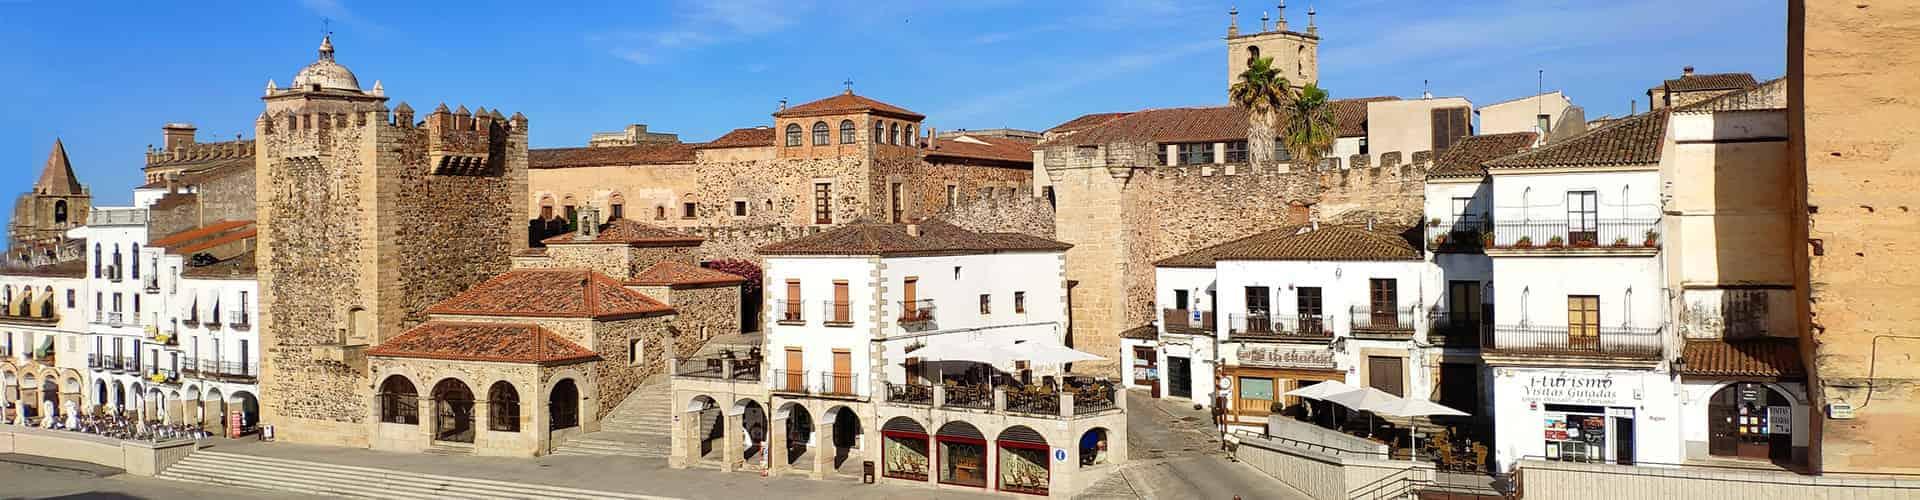 Free Tour Cáceres - Turismo de España